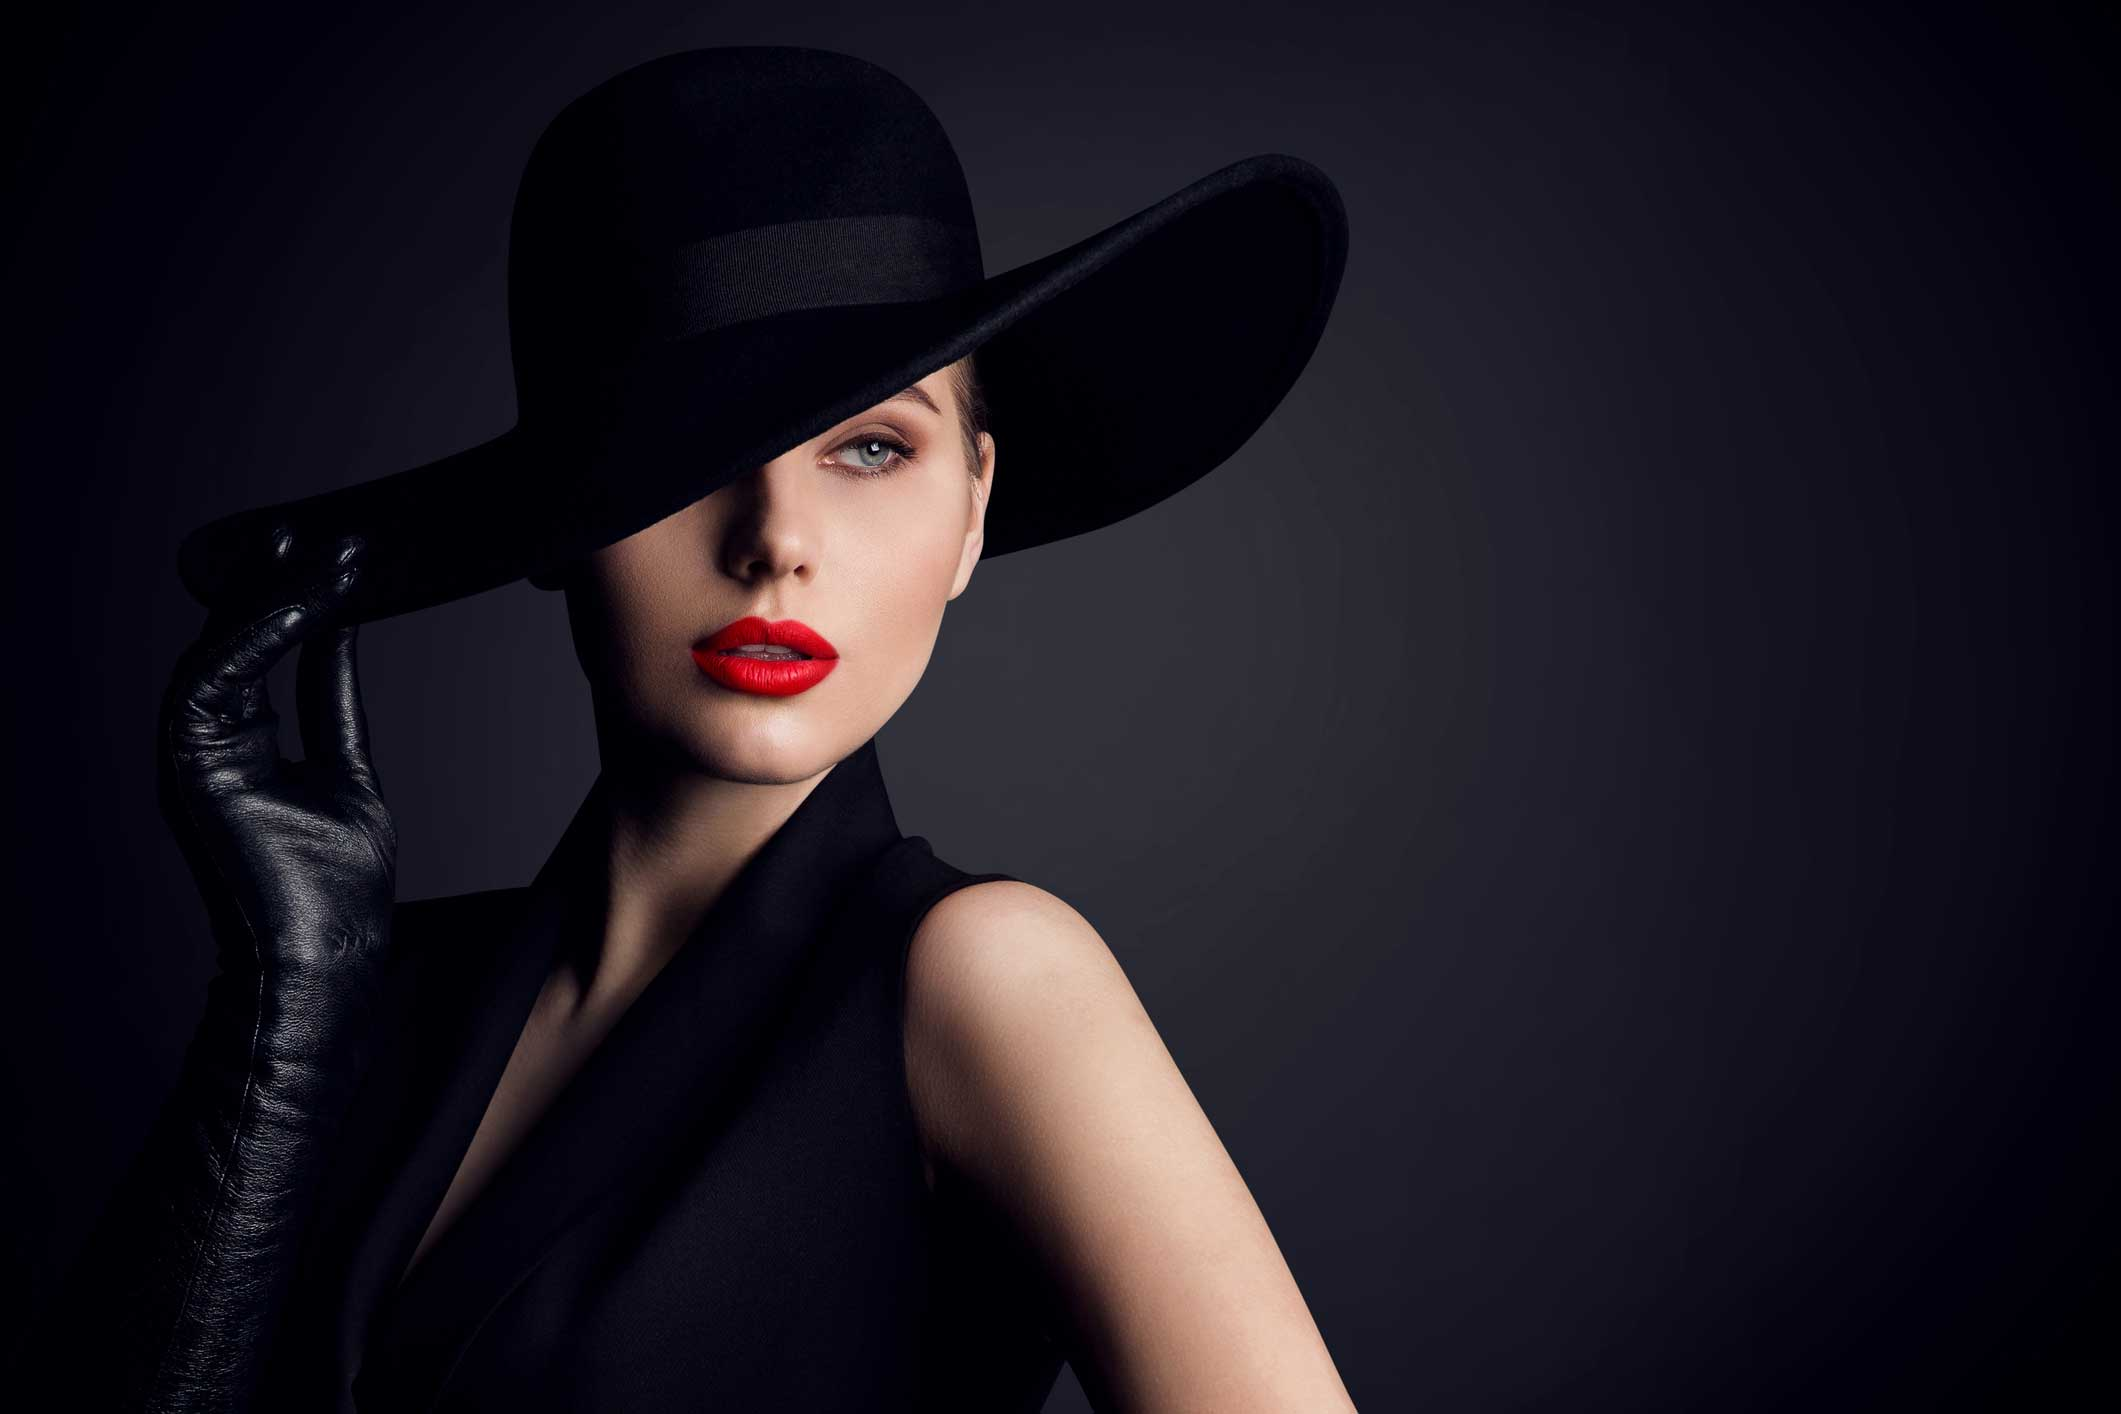 fashion-phootgraphy-1 Fashion Photography Tips For Shooting & Editing Photography Tips